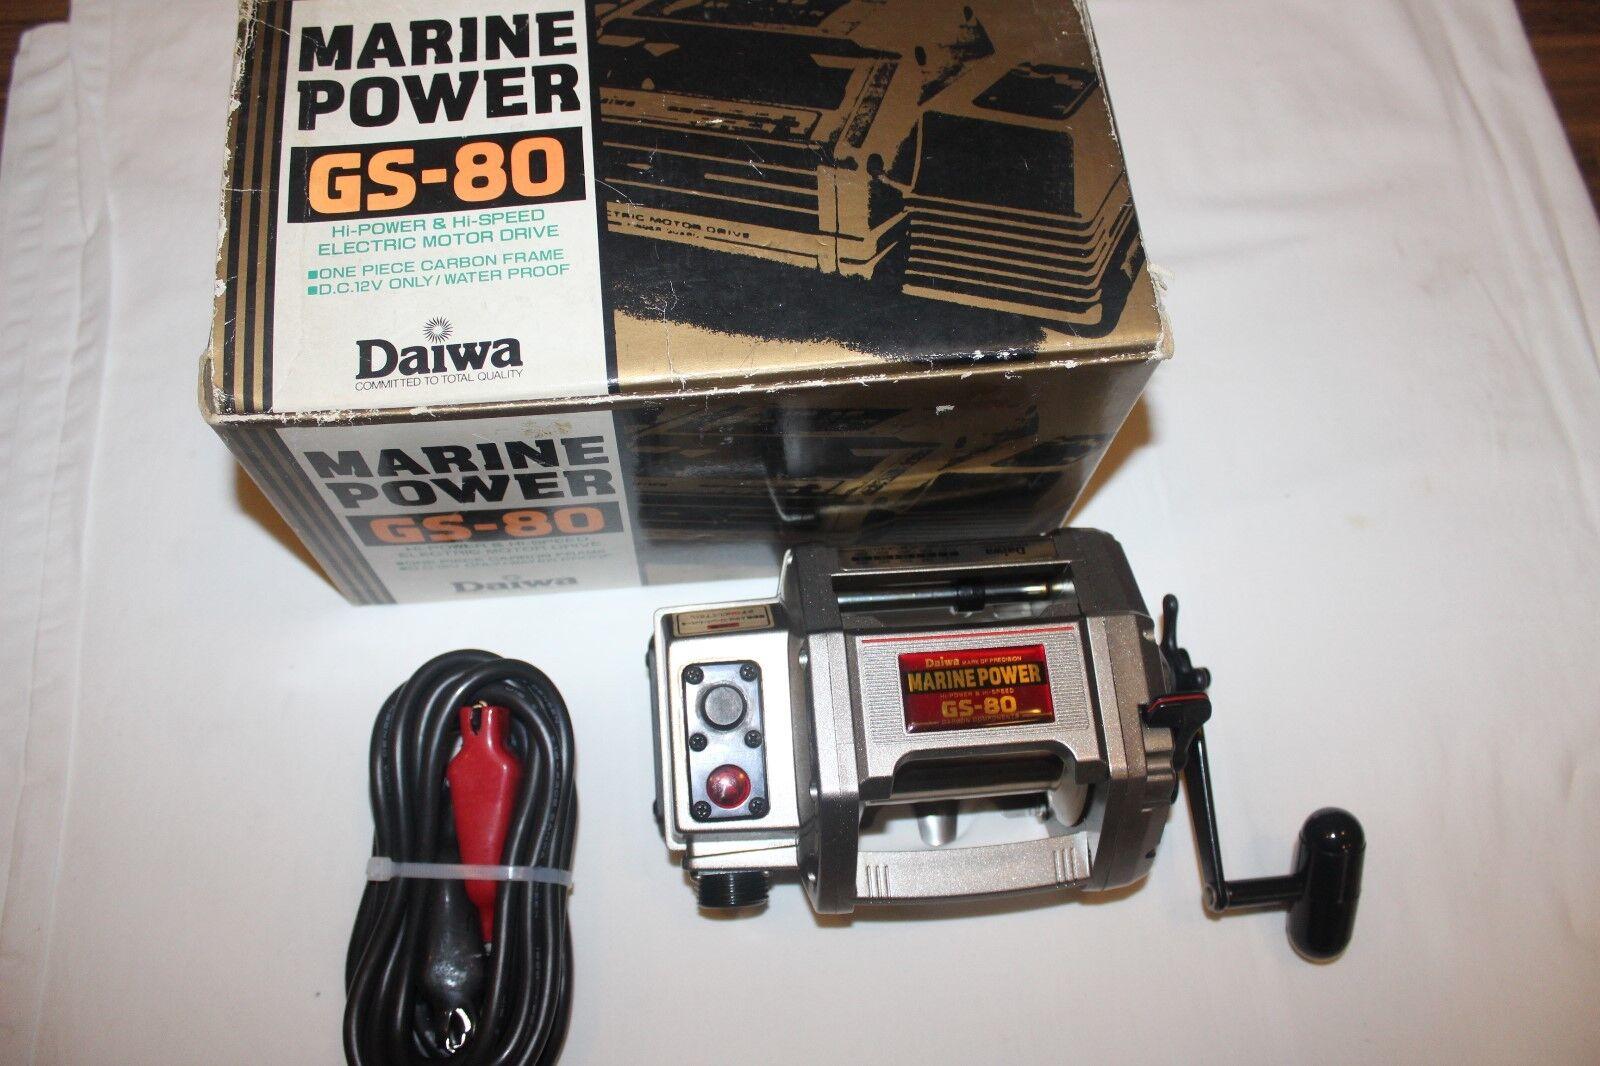 Daiwa Power Marine gs-80 Electric role - in Original Box-Made in Japan-nr-1061